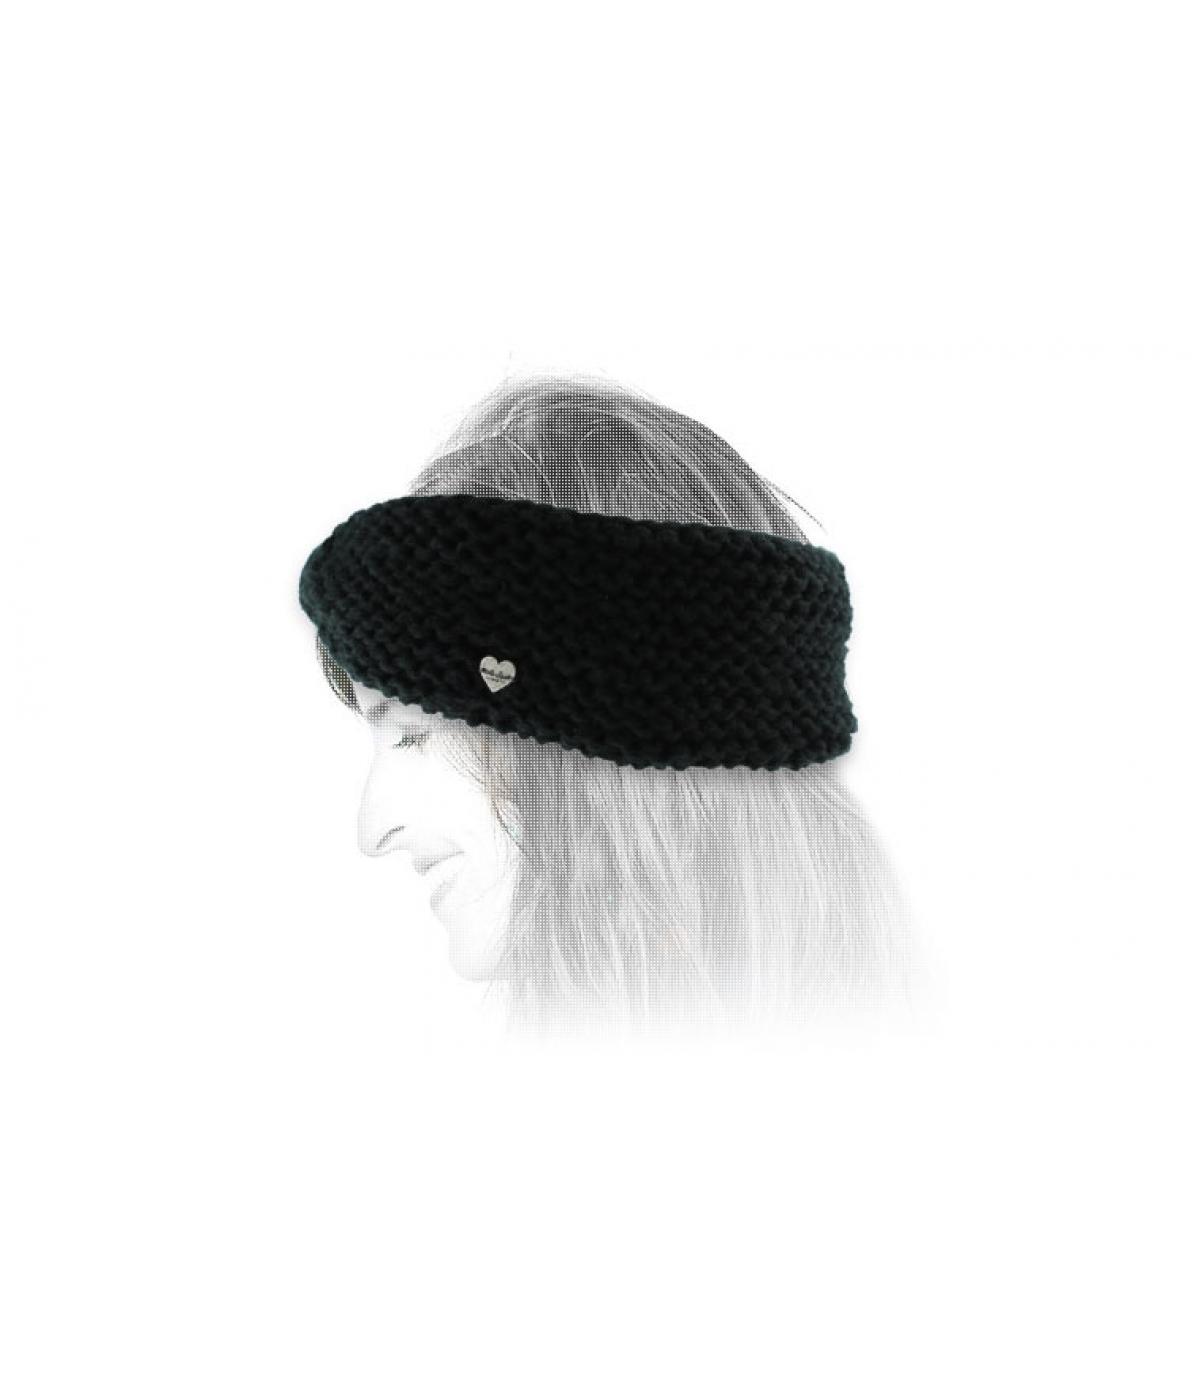 Dettagli Ginger headband black - image 3